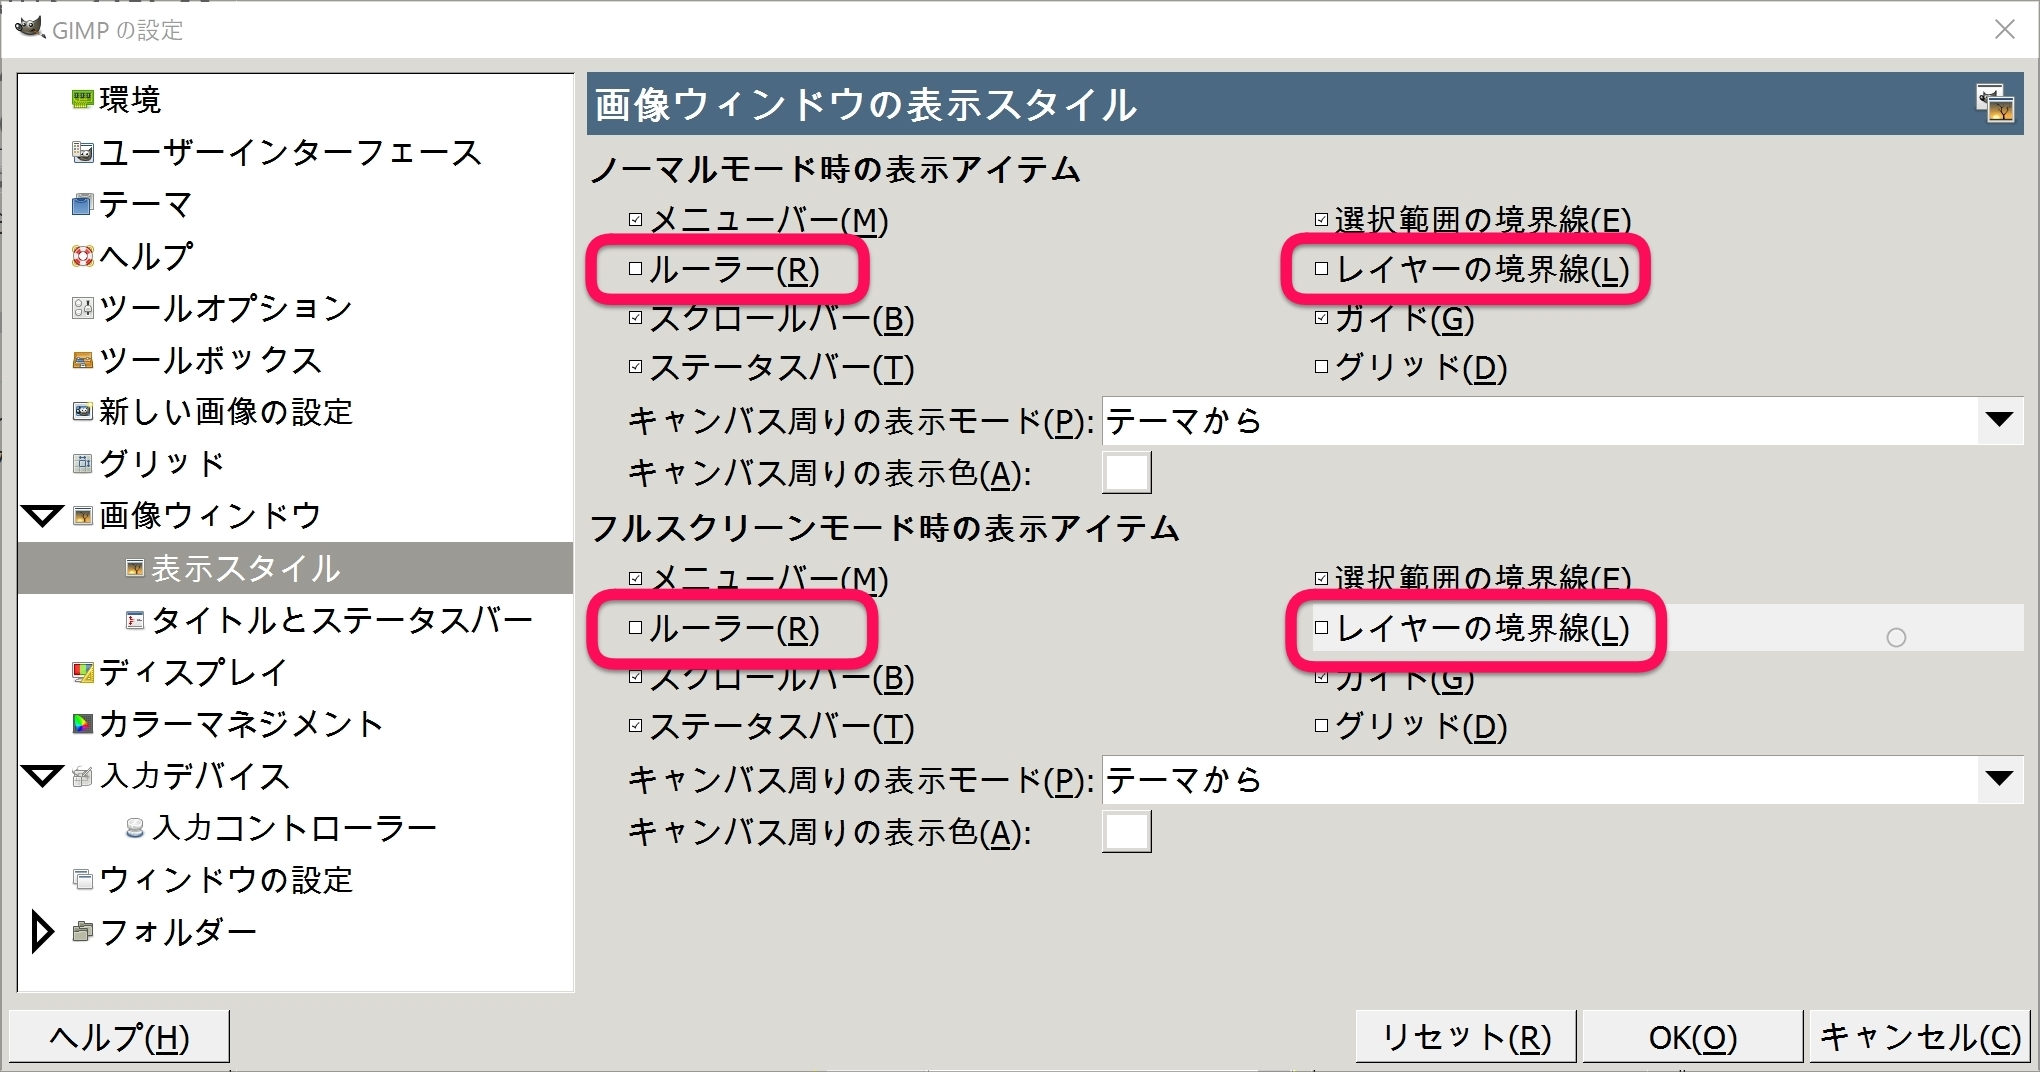 GIMP 表示スタイル 設定